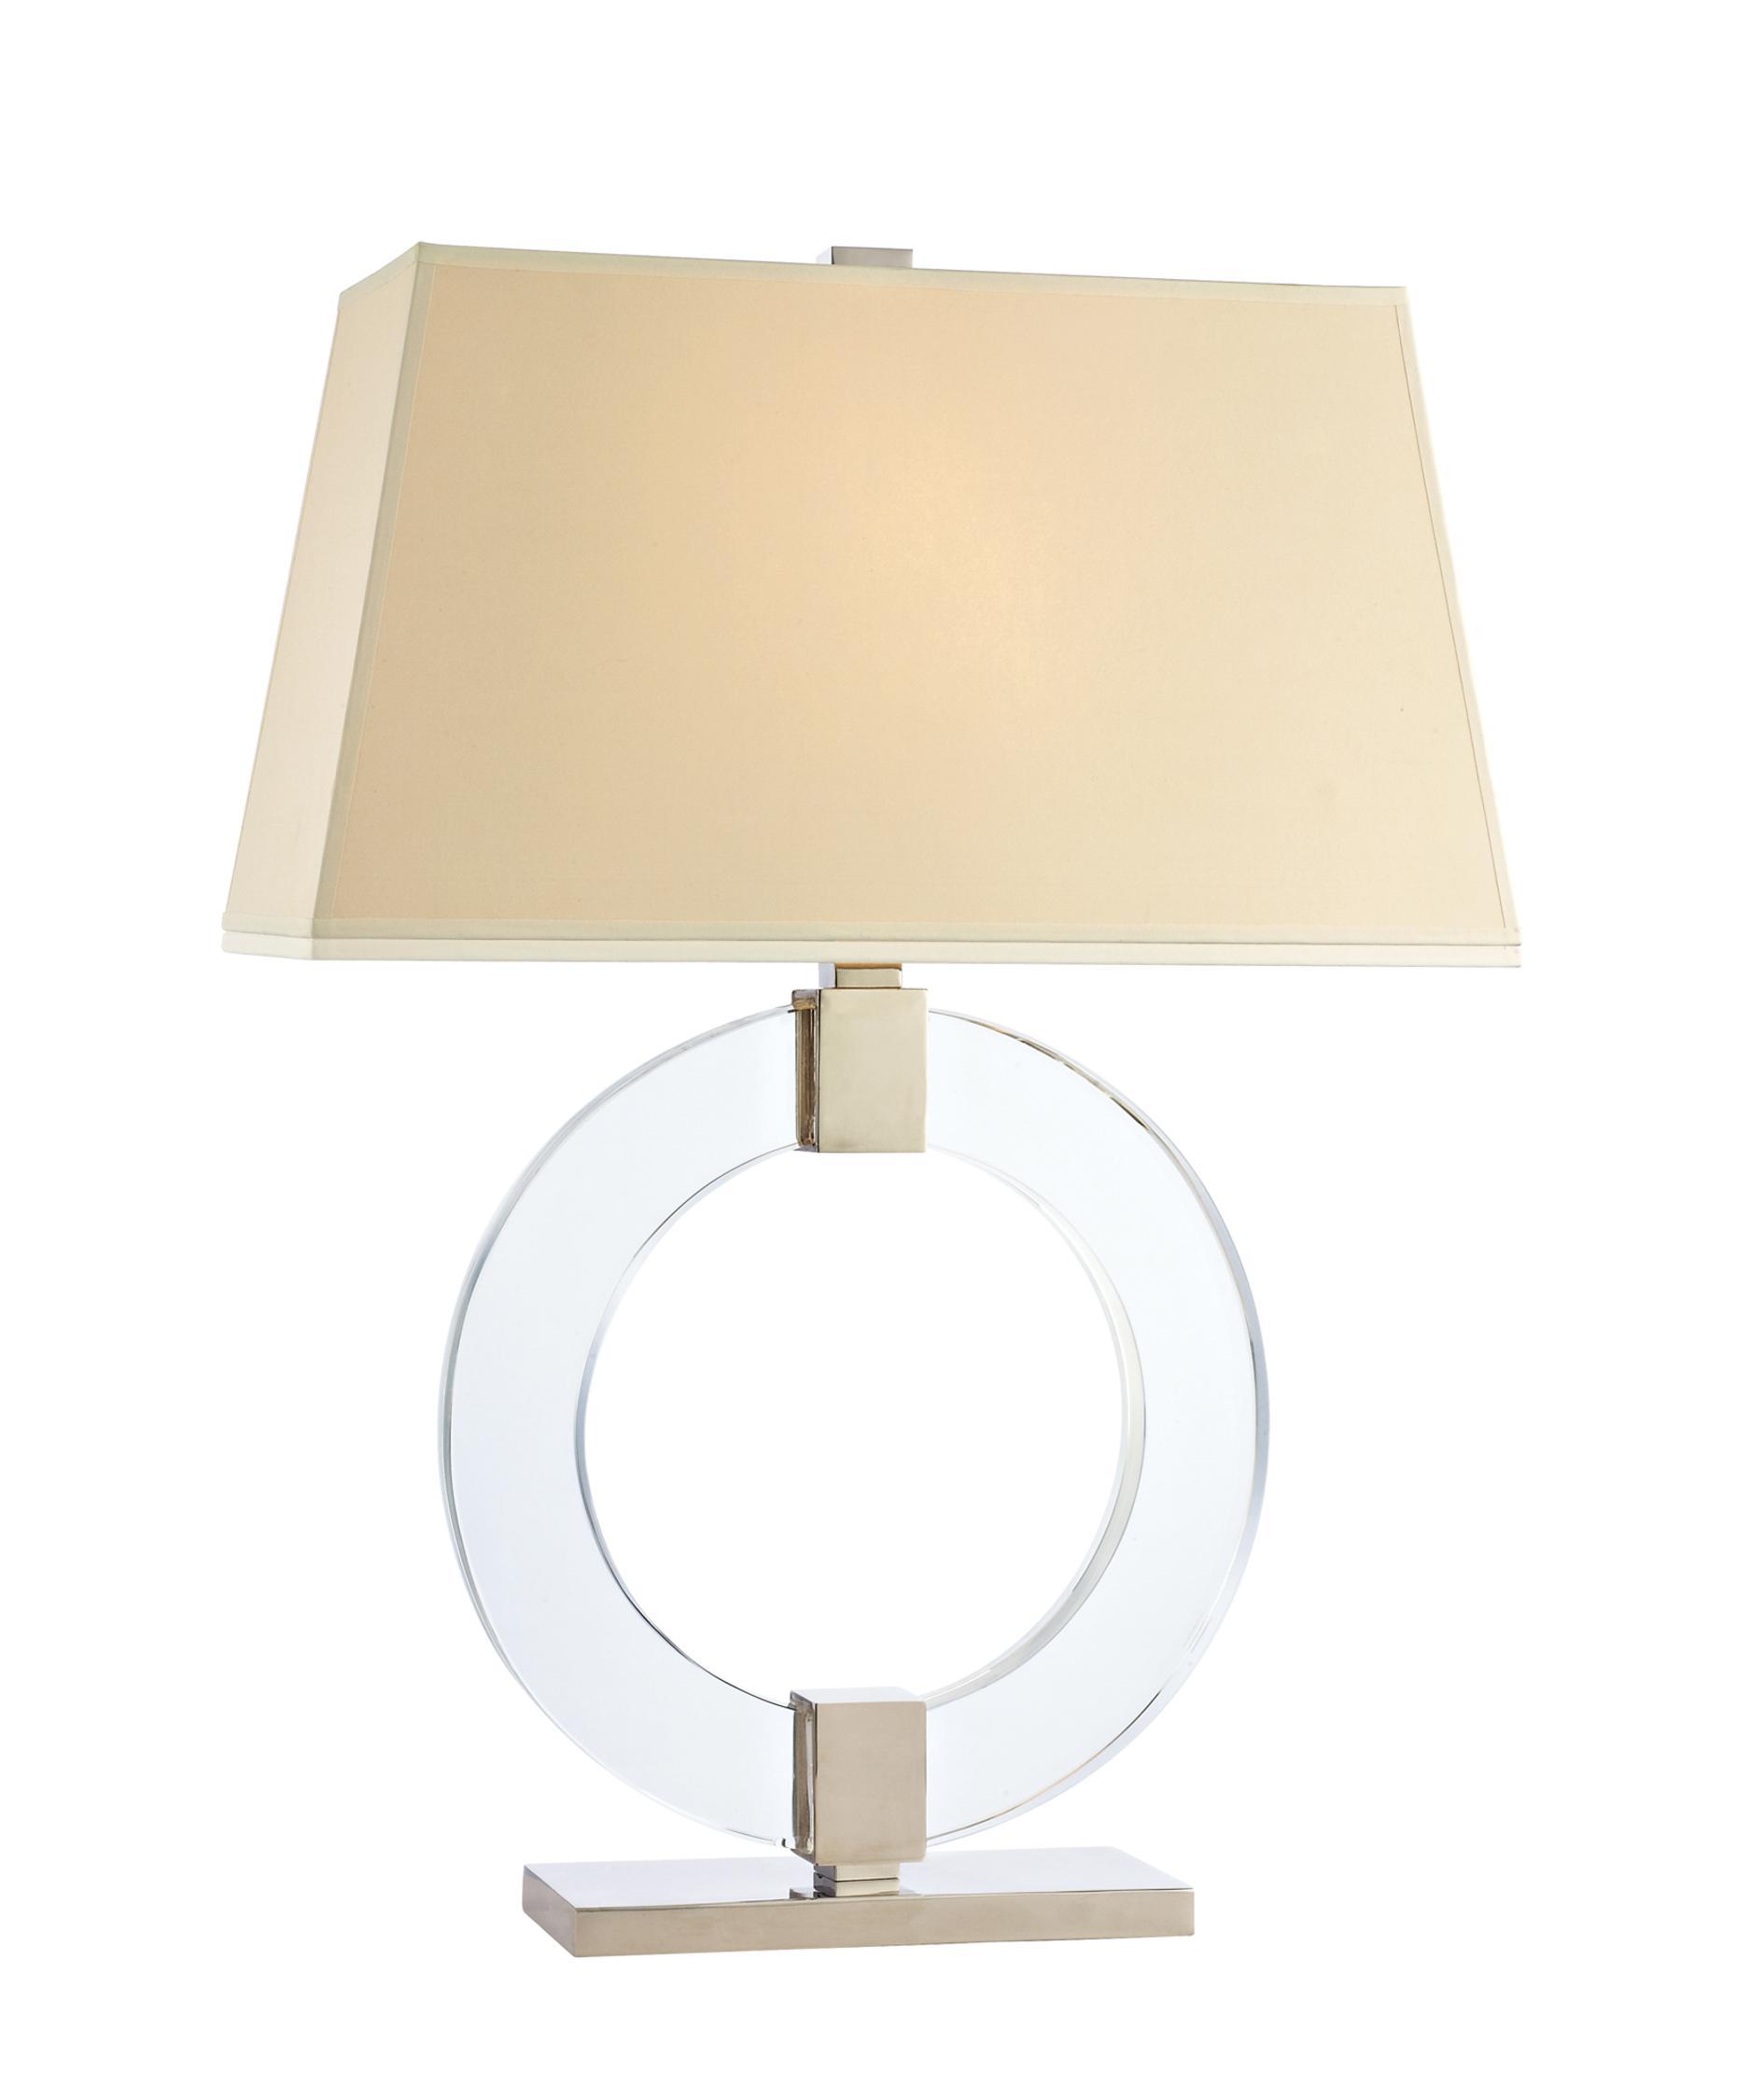 hudson valley l606 roslyn 24 inch table lamp capitol lighting 1. Black Bedroom Furniture Sets. Home Design Ideas